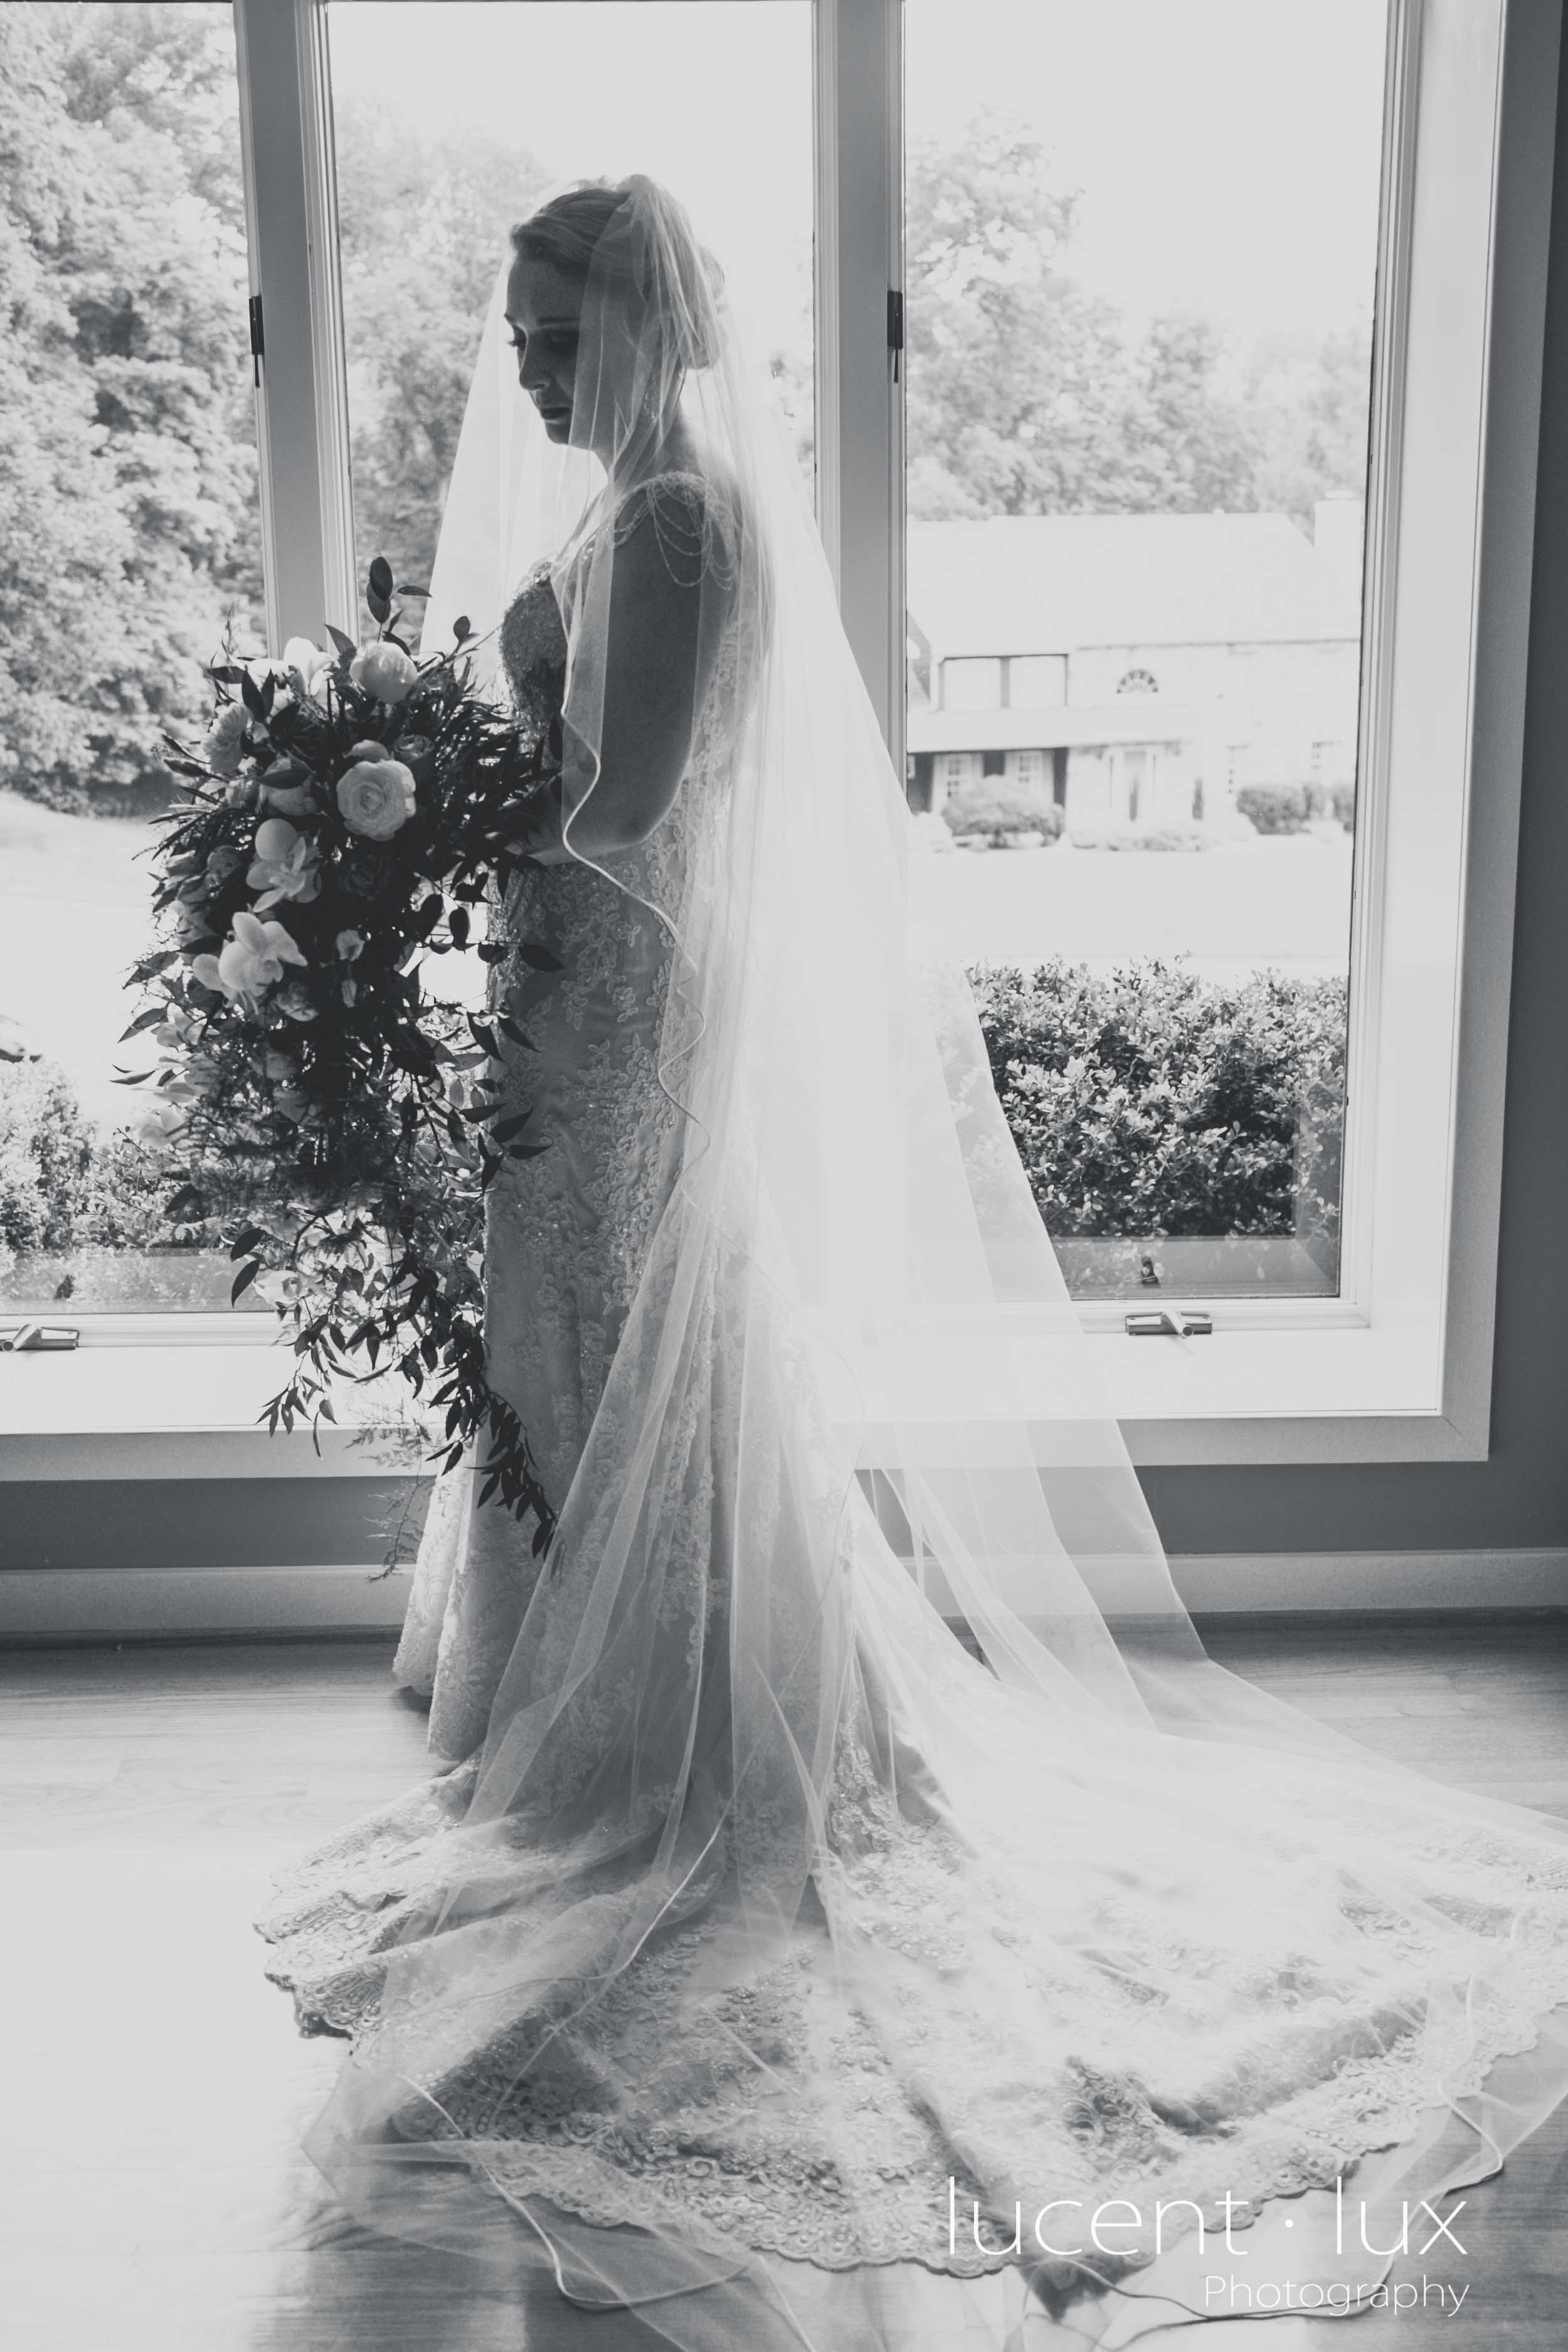 Wedding-Photography-Maryland-Pennsylvania-Photographer-Mendenhall-Inn-Media-Portrait-Event-111.jpg